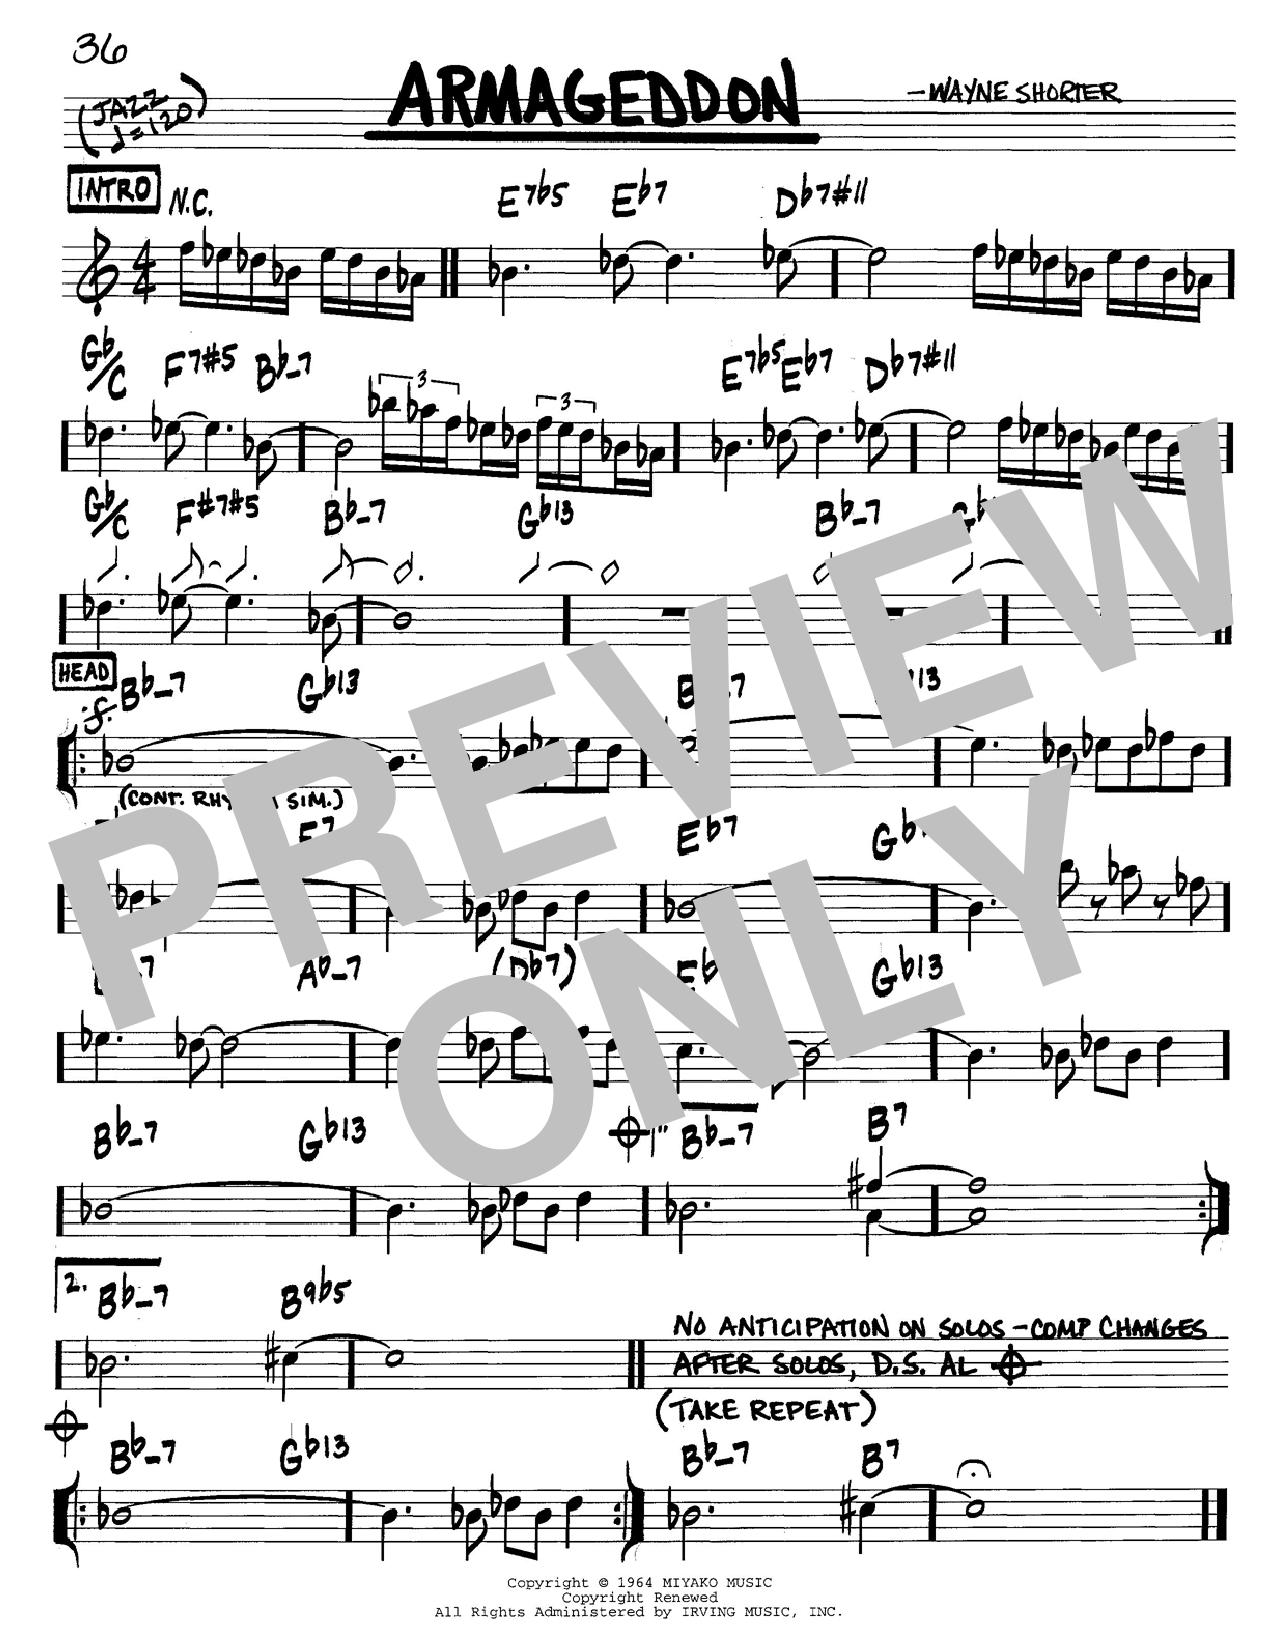 Wayne Shorter Armageddon sheet music notes and chords. Download Printable PDF.